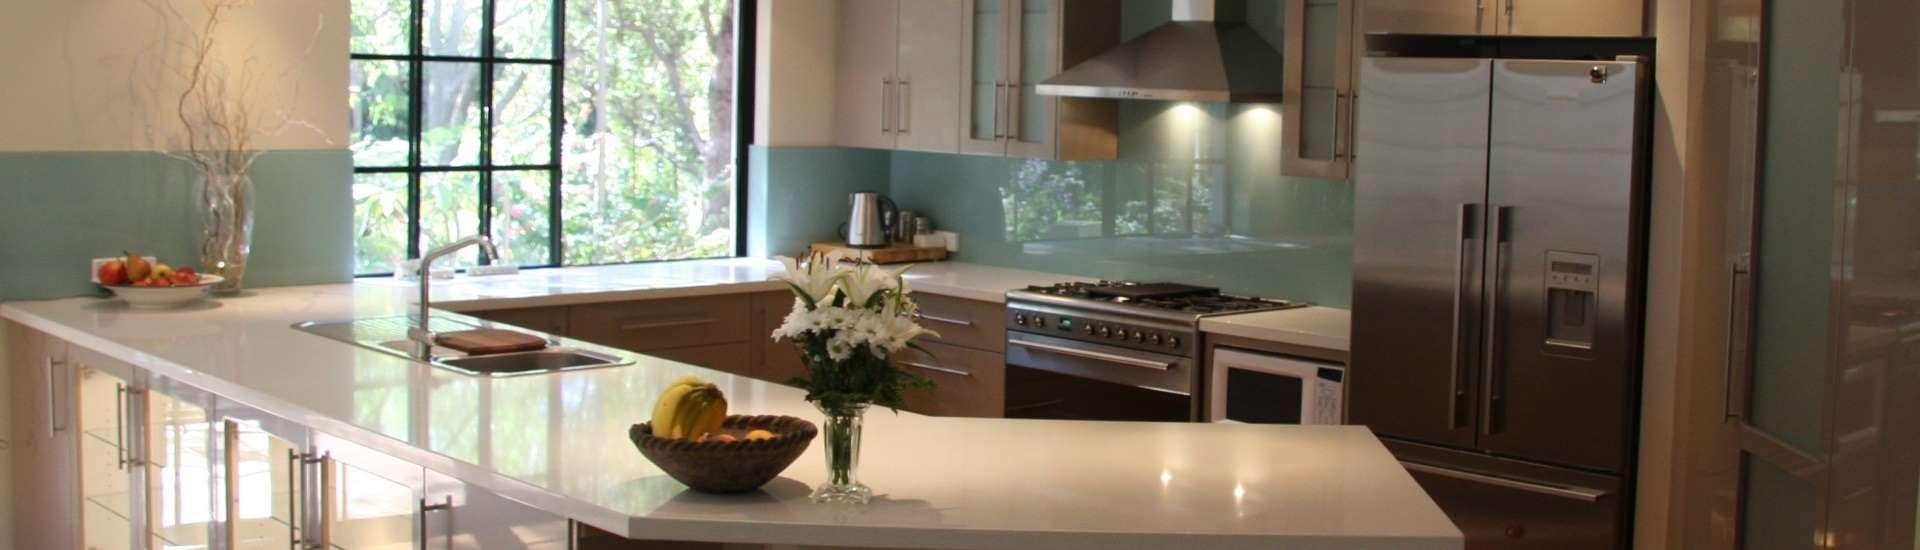 . Kitchen Solutions   Bathroom   Kitchen Renovations Perth WA